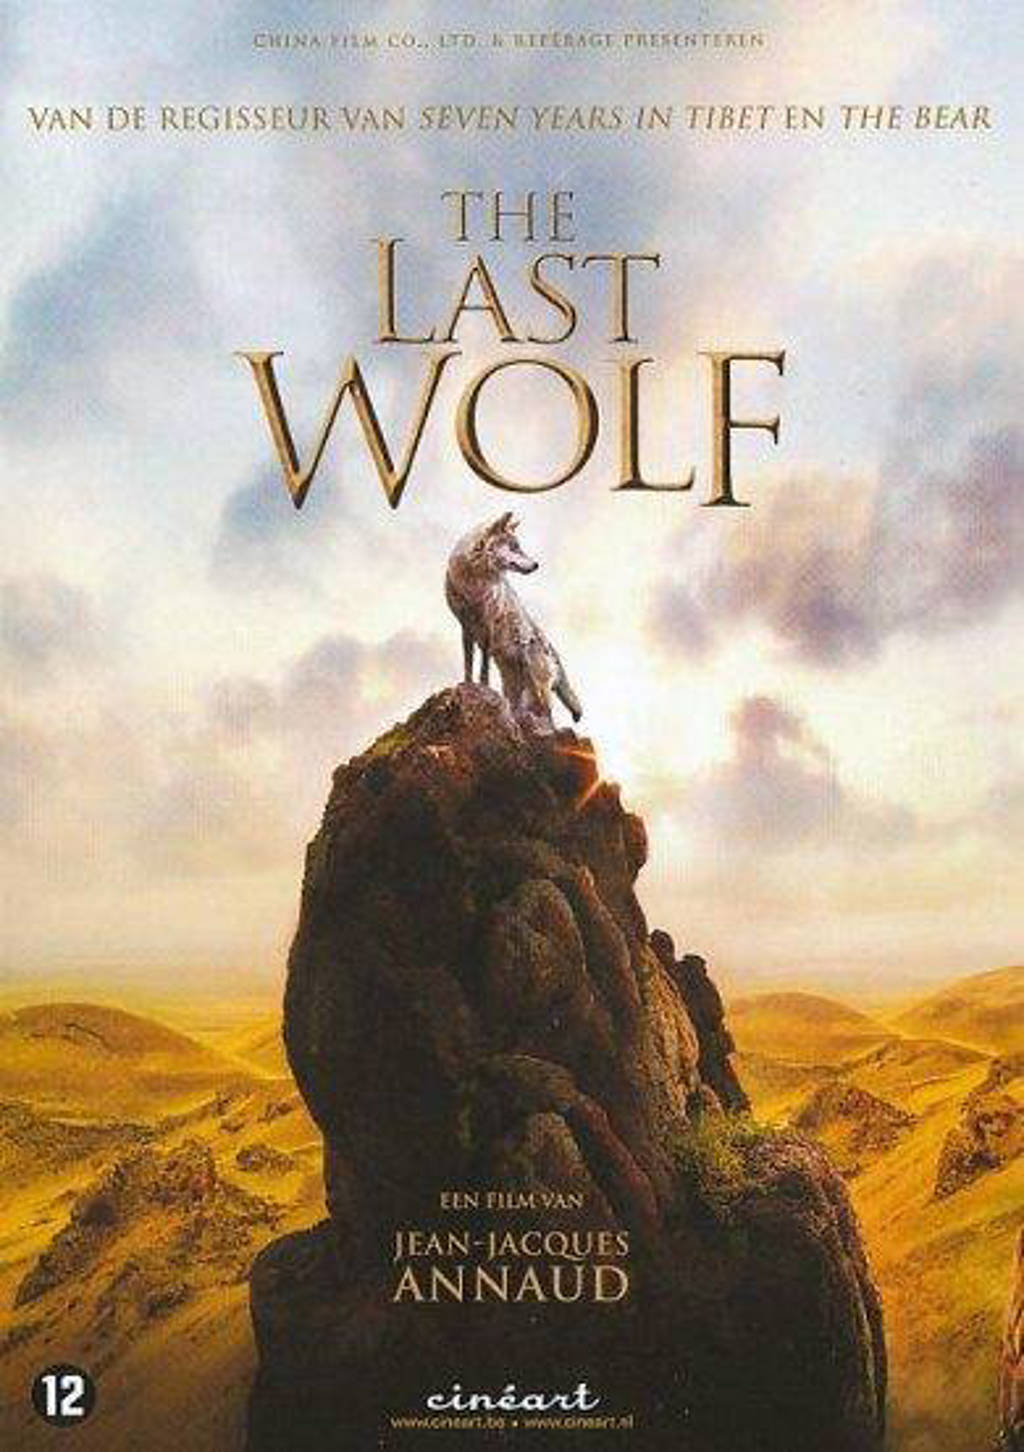 Last wolf (DVD)